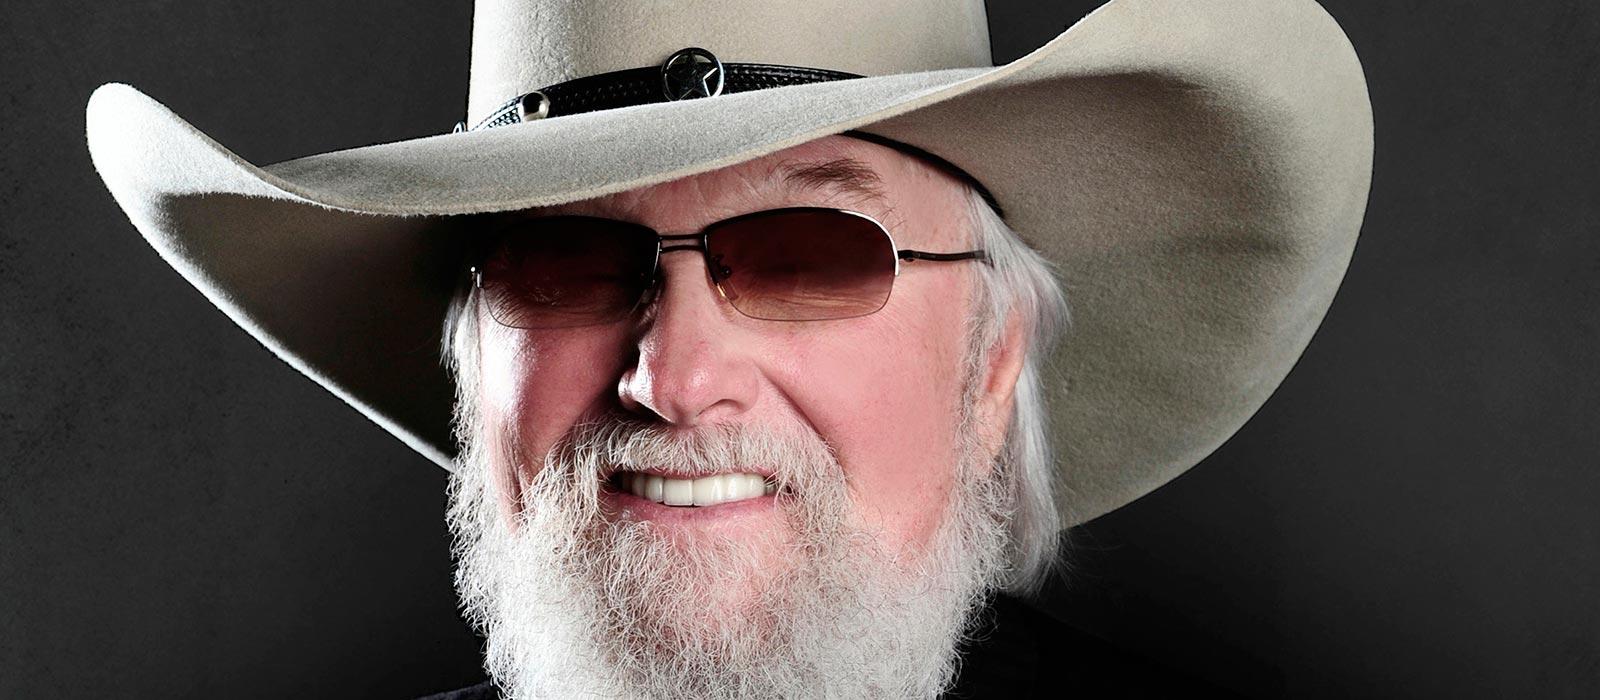 Q&A – Charlie Daniels (Country Music Legend)